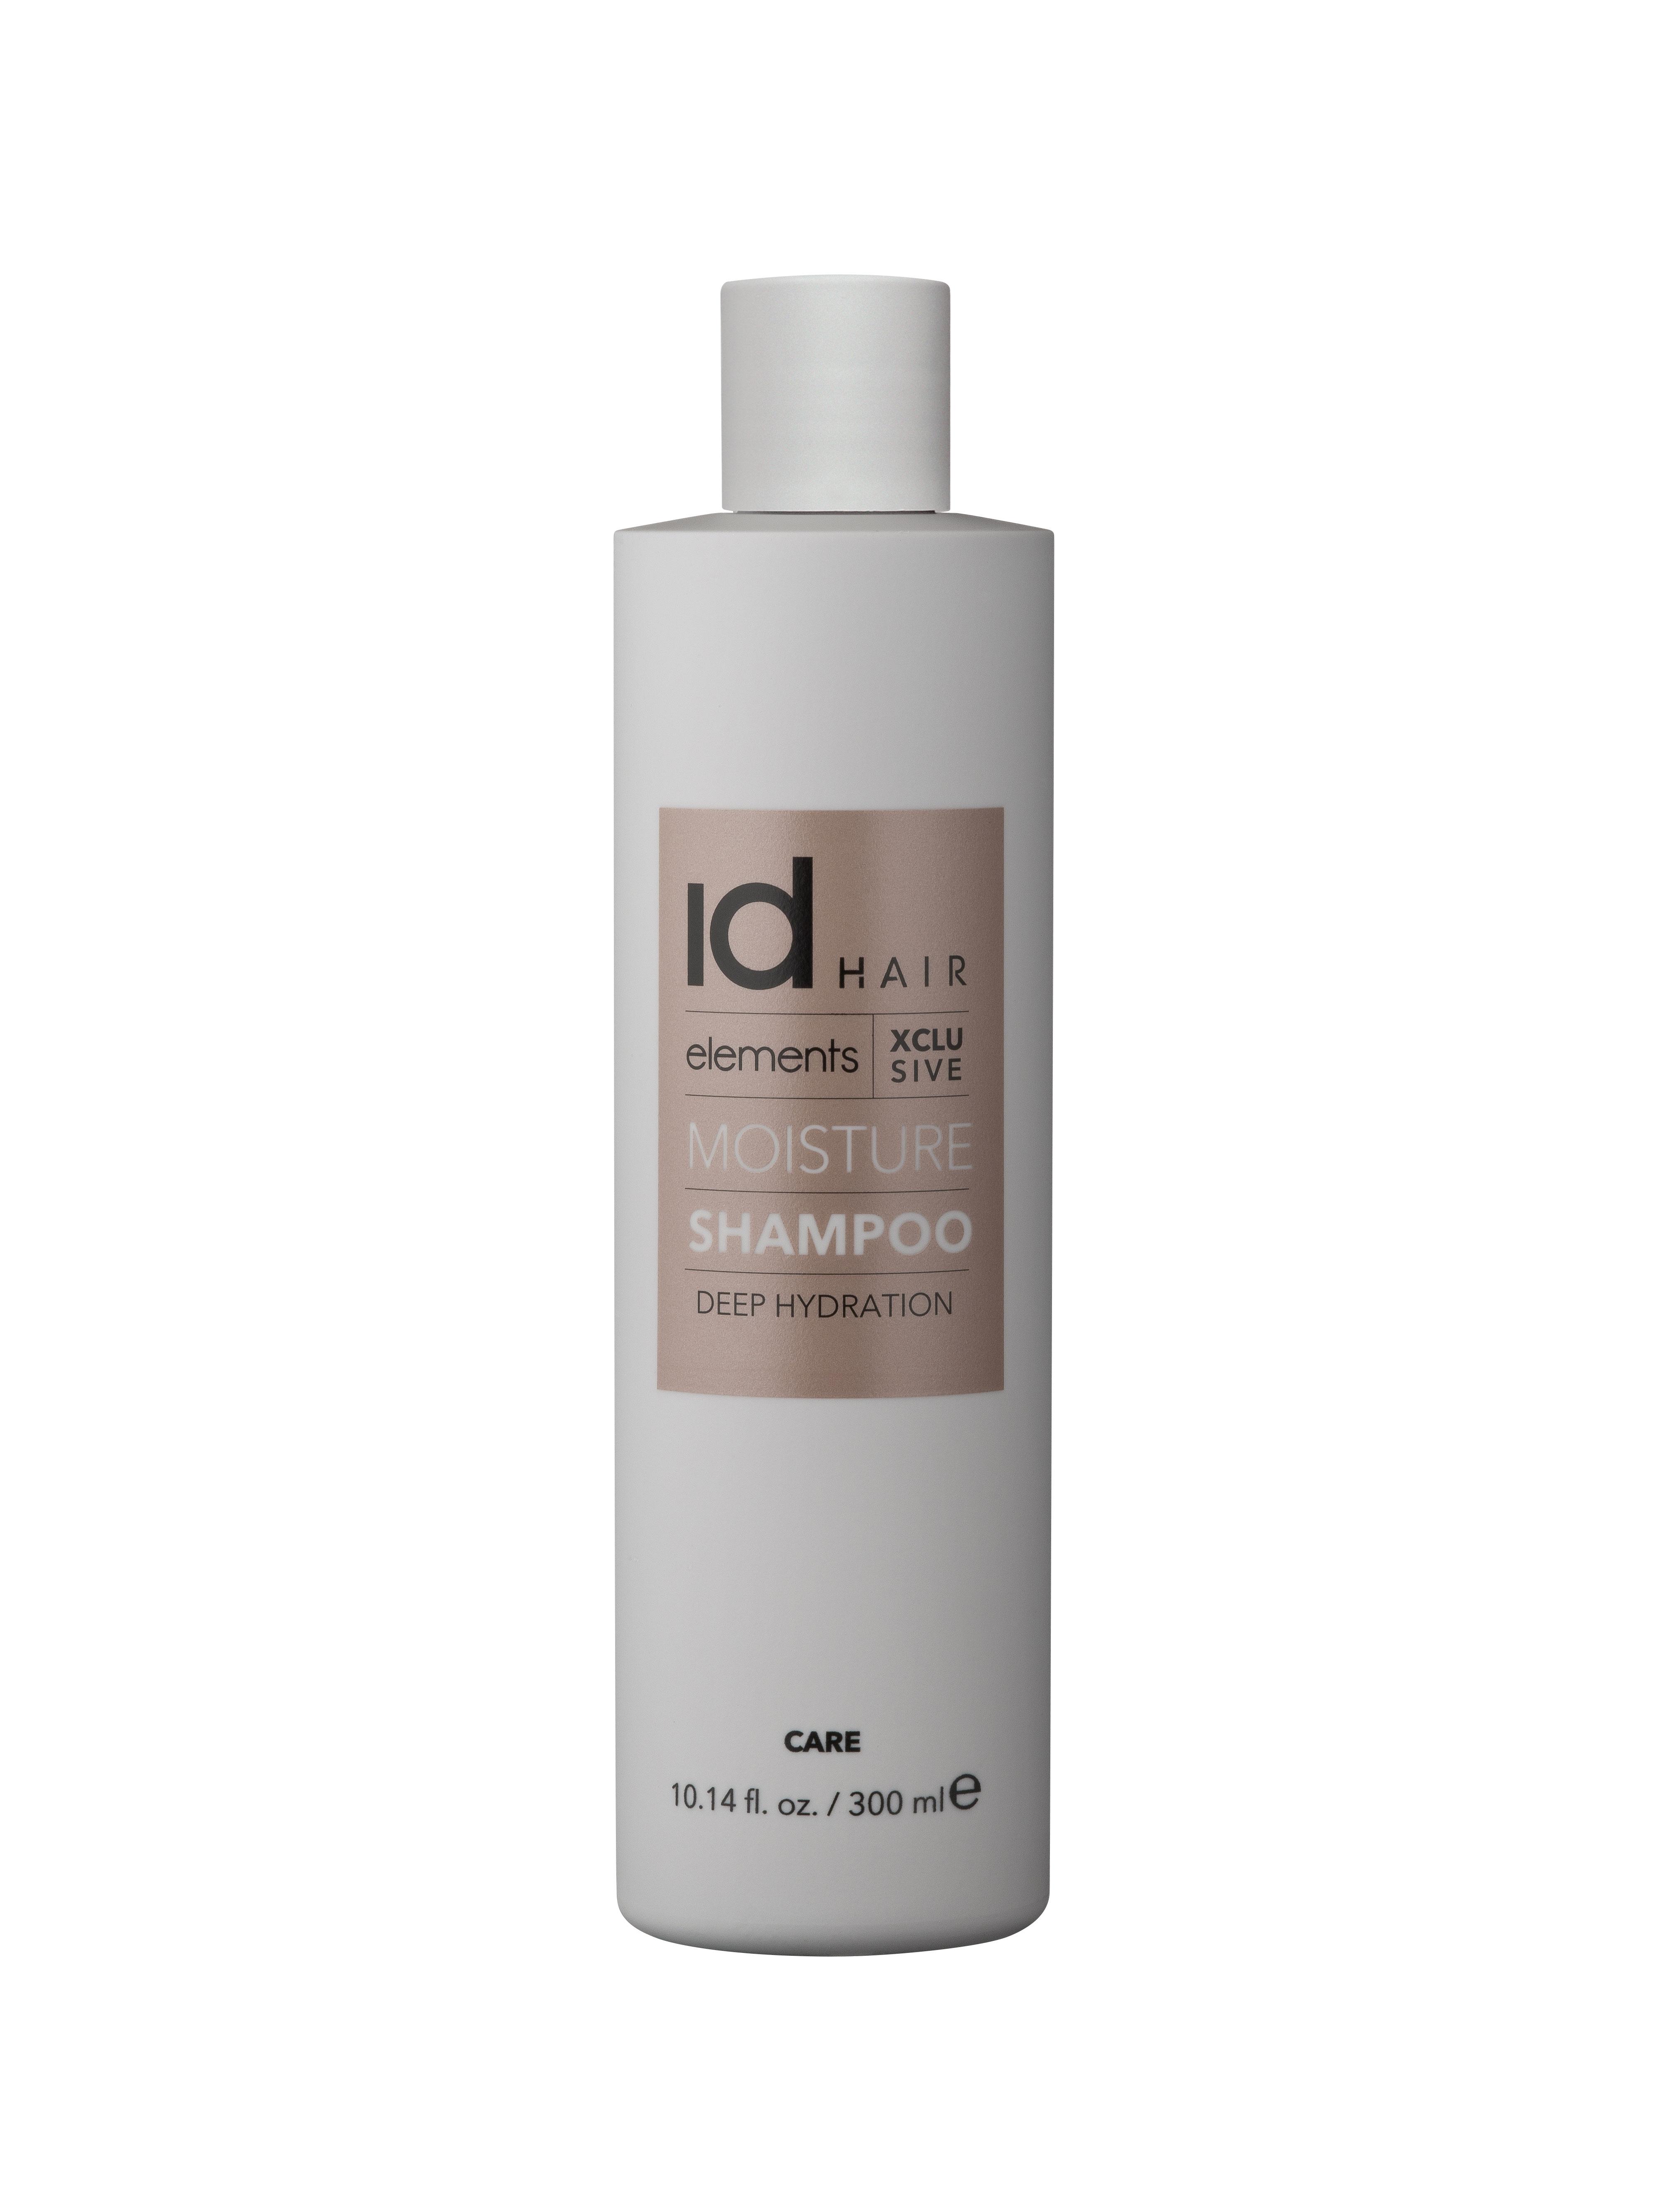 IdHAIR - Elements Xclusive Moisture Shampoo 300 ml